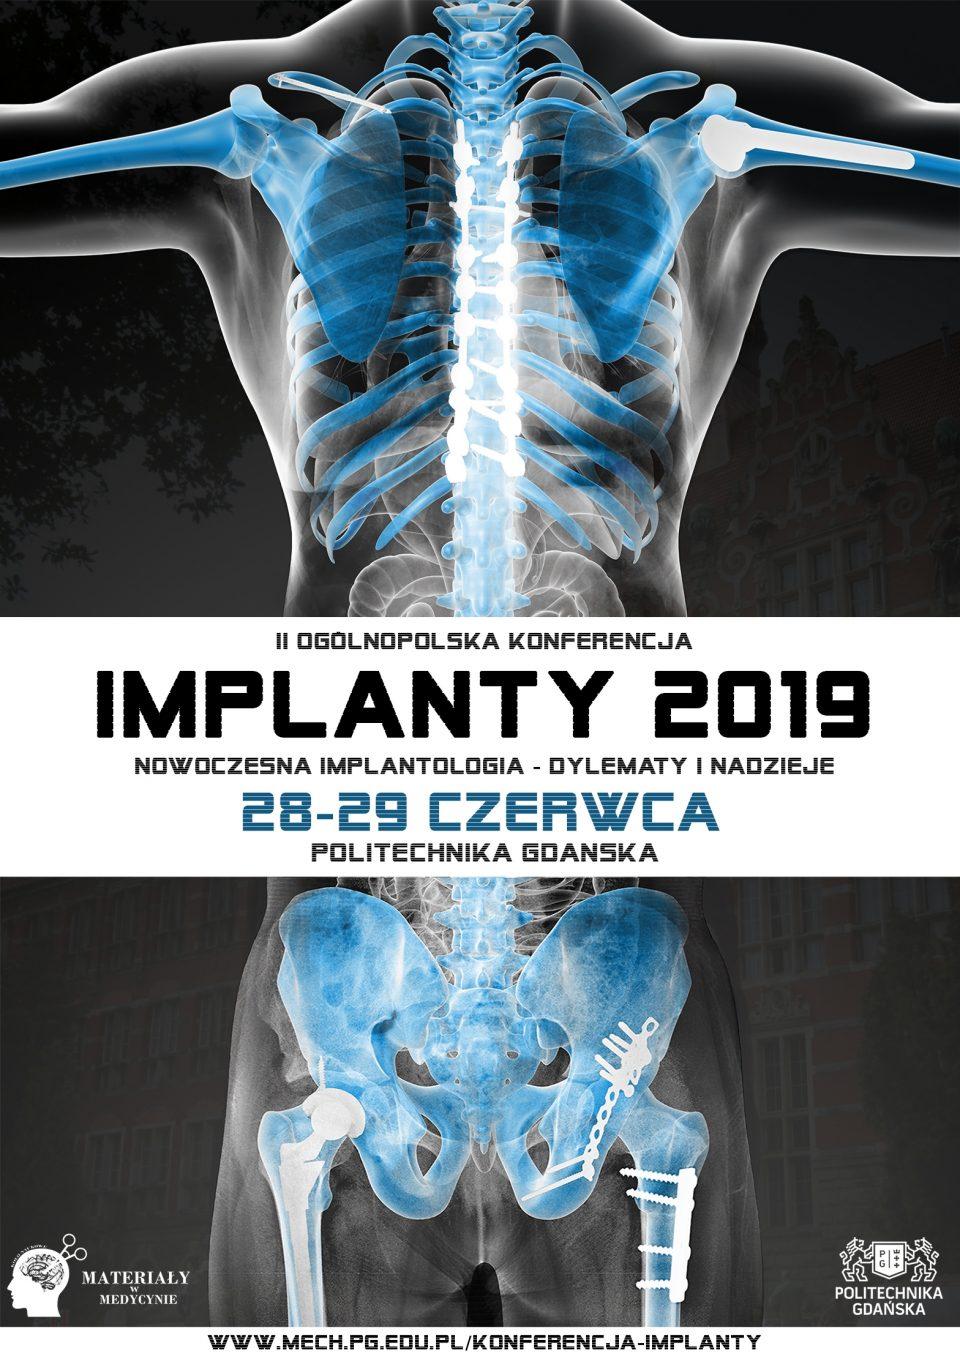 Plakat implanty 2019